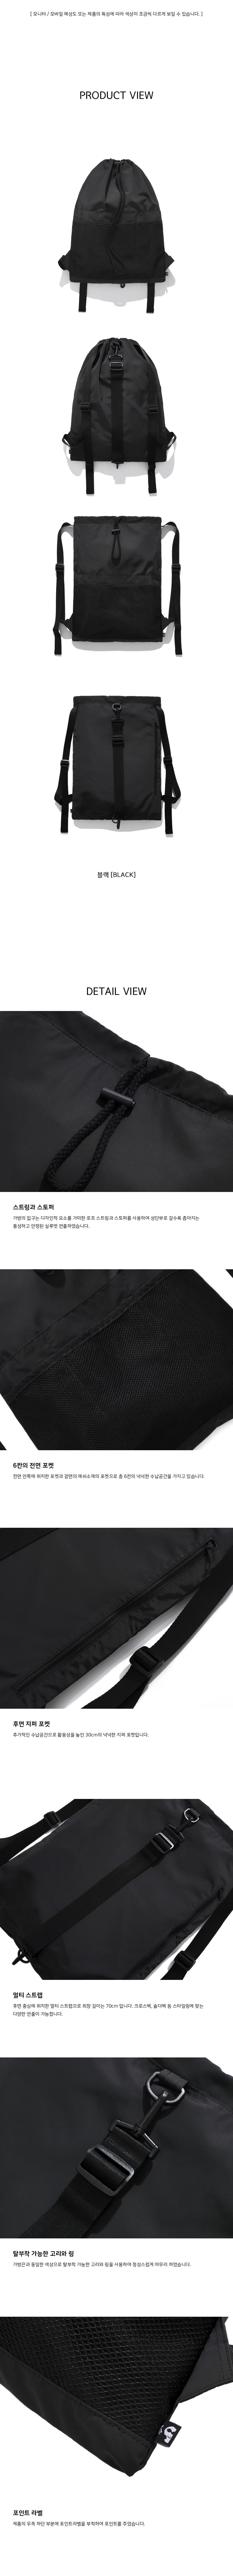 4366_detail_black_de.jpg